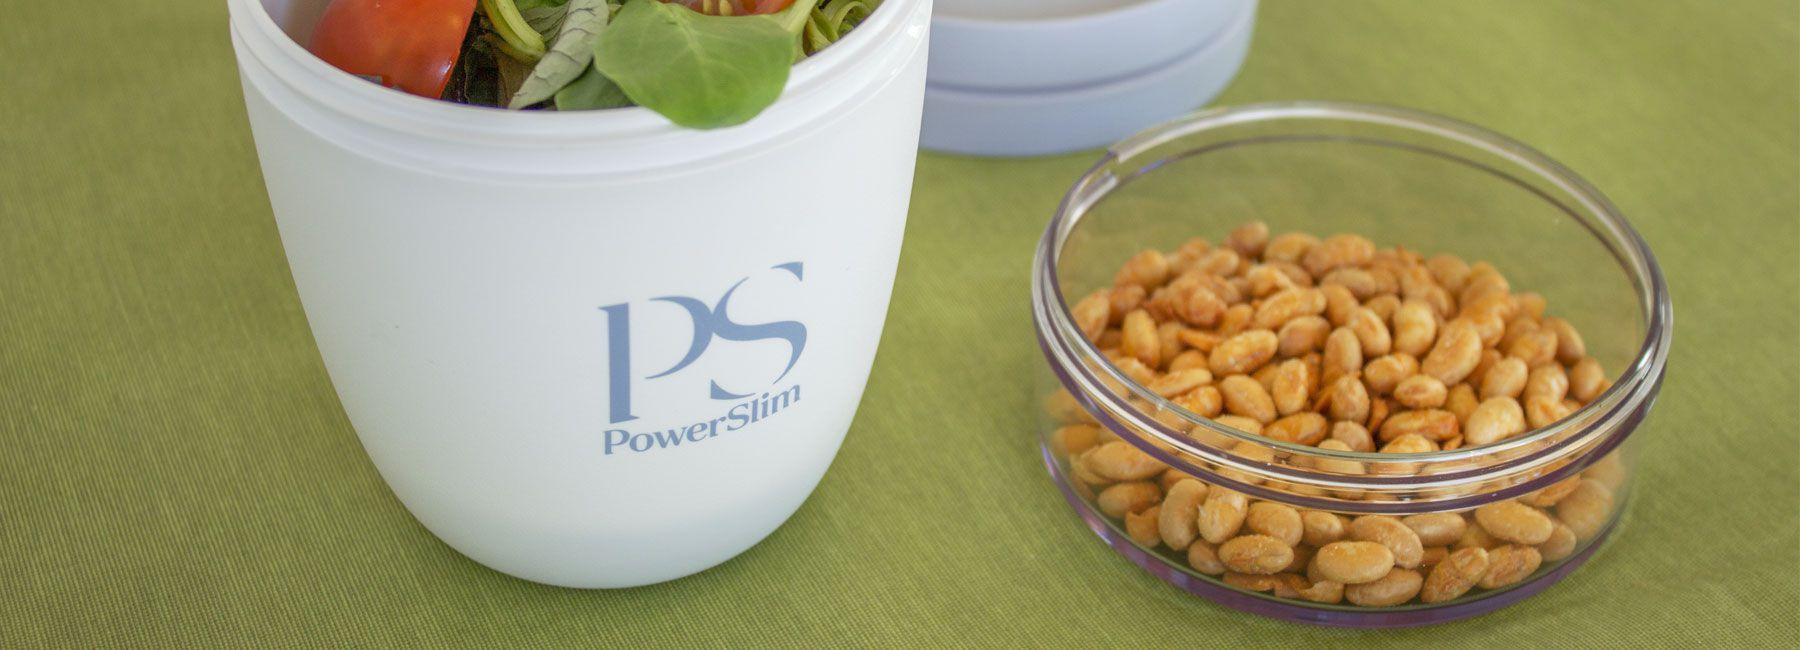 PowerSlim lunchpot